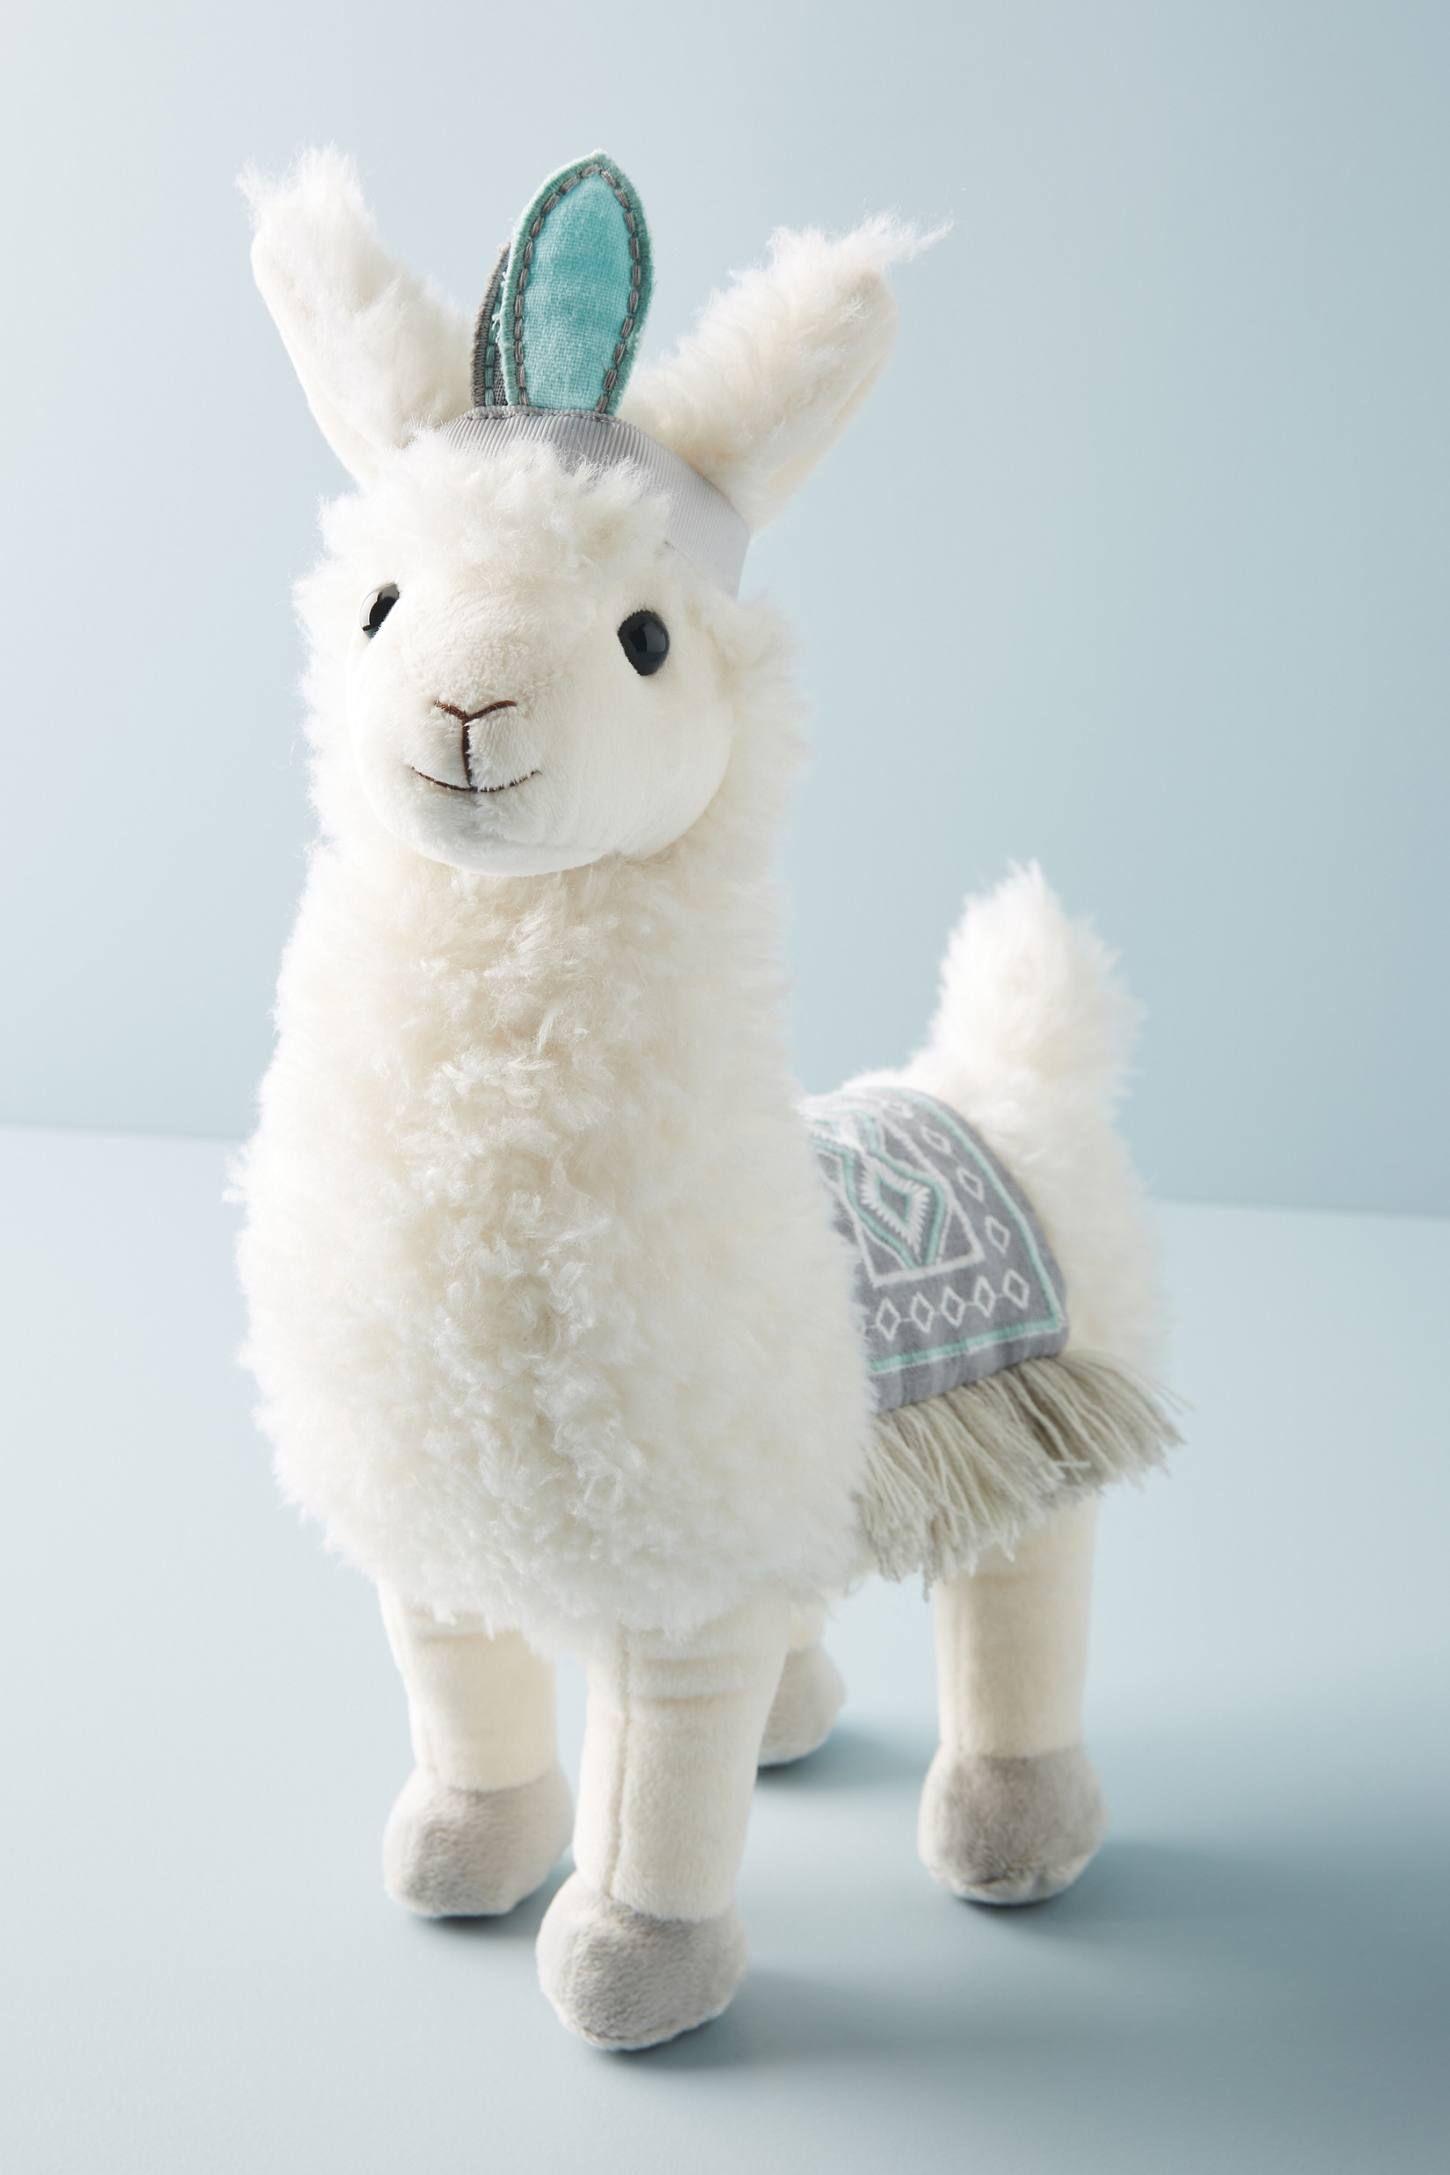 Lucy the Llama Stuffed Animal Llama stuffed animal